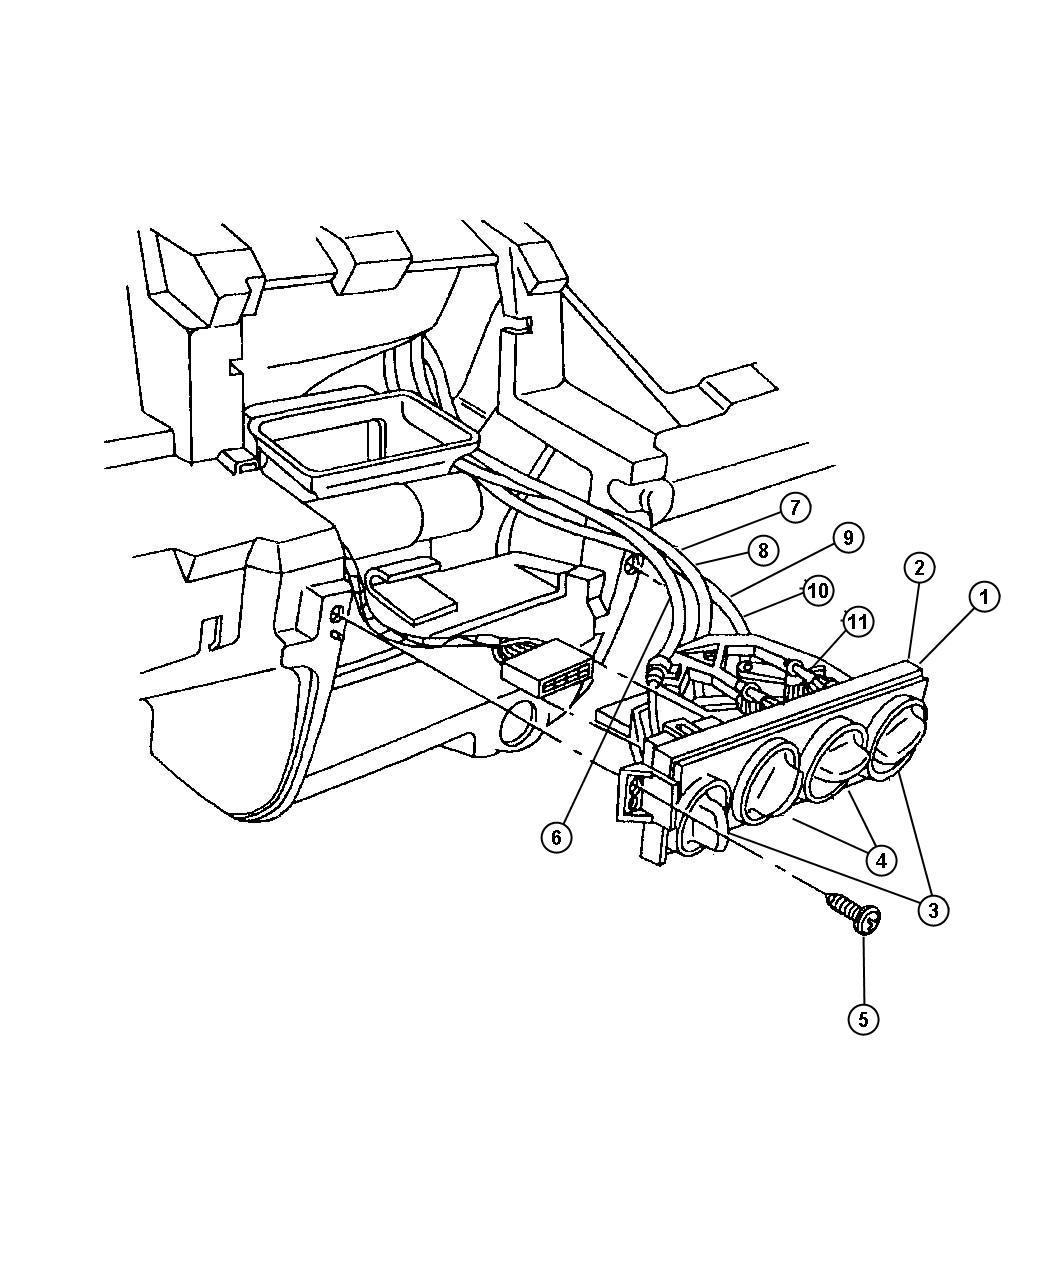 Chrysler Pt Cruiser Cable. Heater. Temperature control